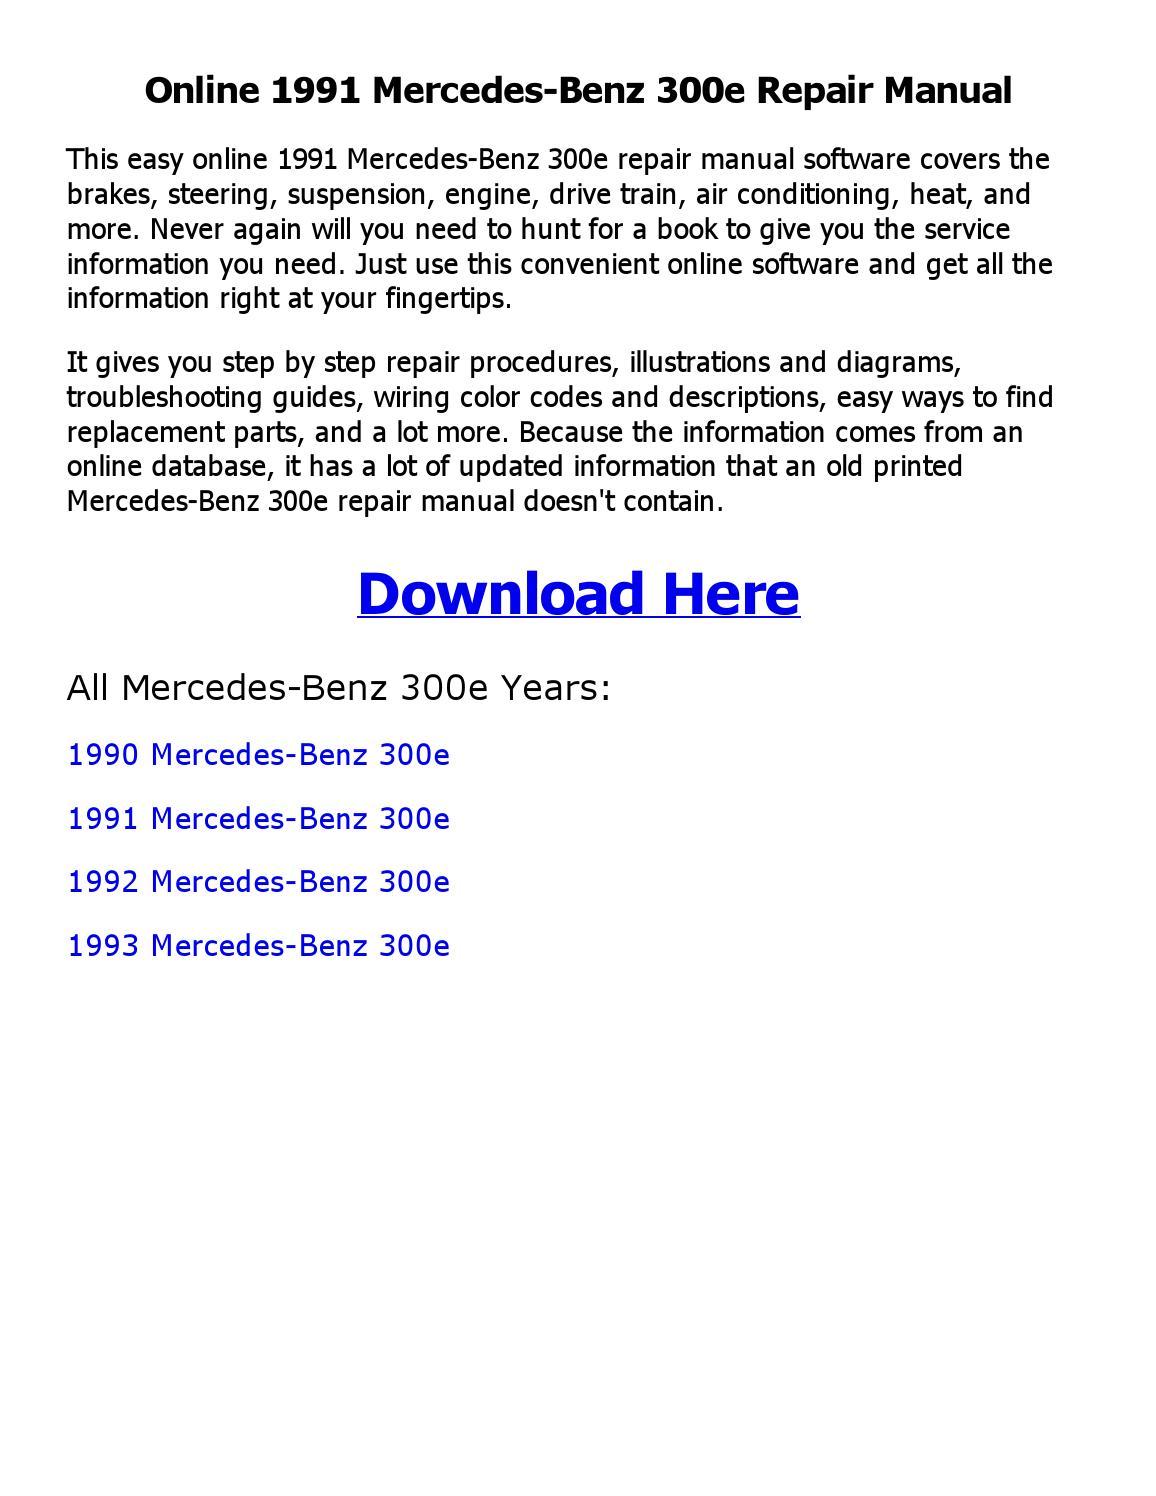 1991 Mercedes Benz 300e Repair Manual Online By Ahmed Issuu Wiring Diagram